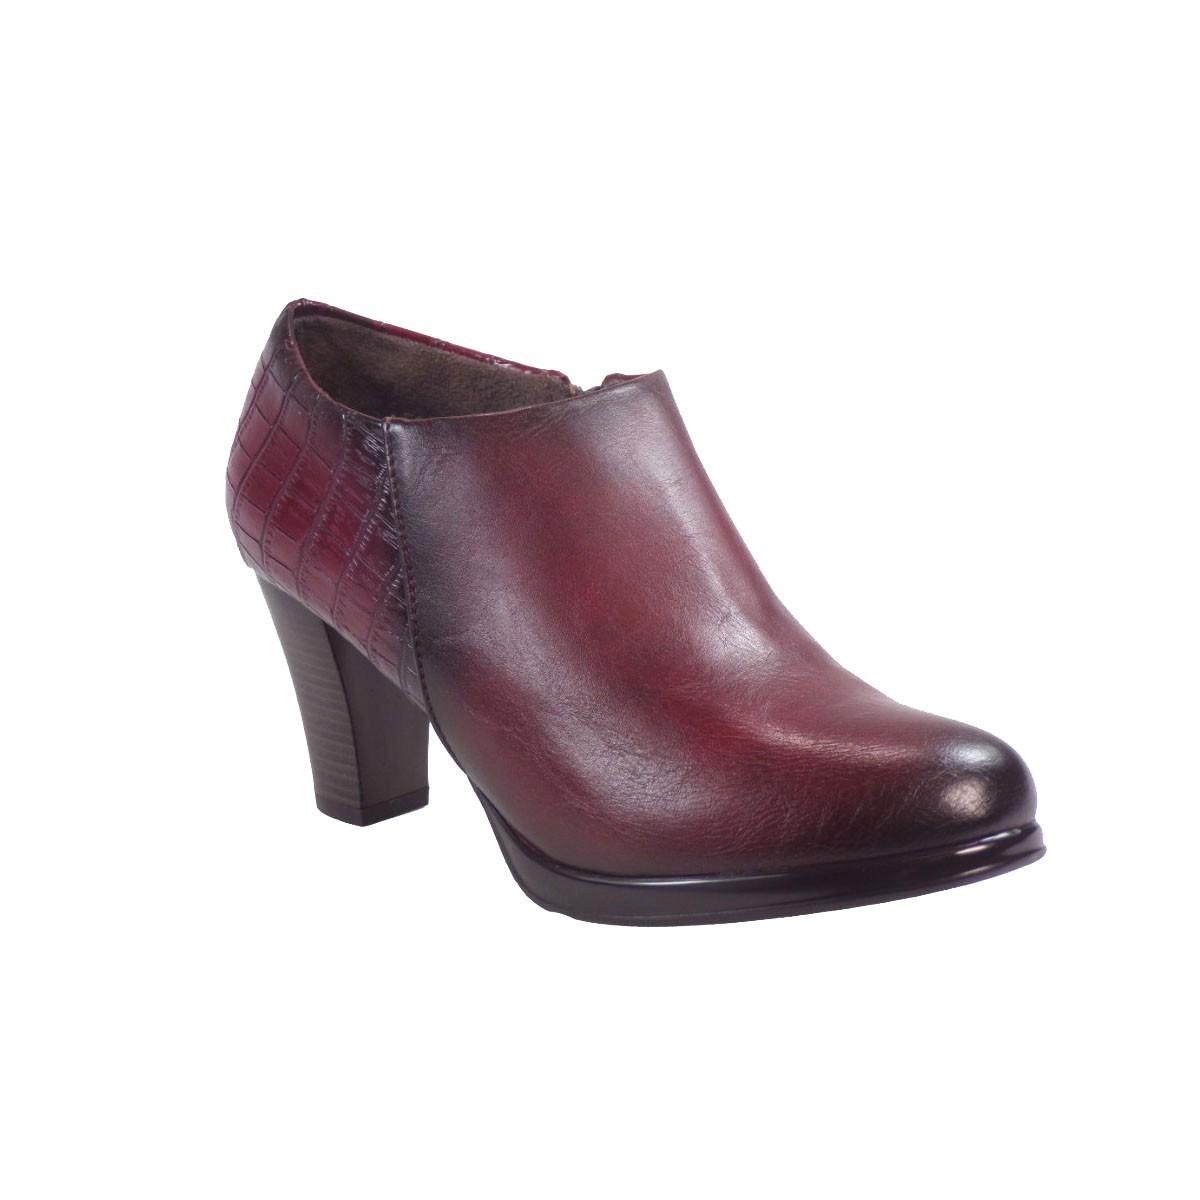 63c8b9007e5 Envie Shoes Γυναικεία Παπούτσια Aστραγάλου Ε63-06780-39 Mπορντώ ...